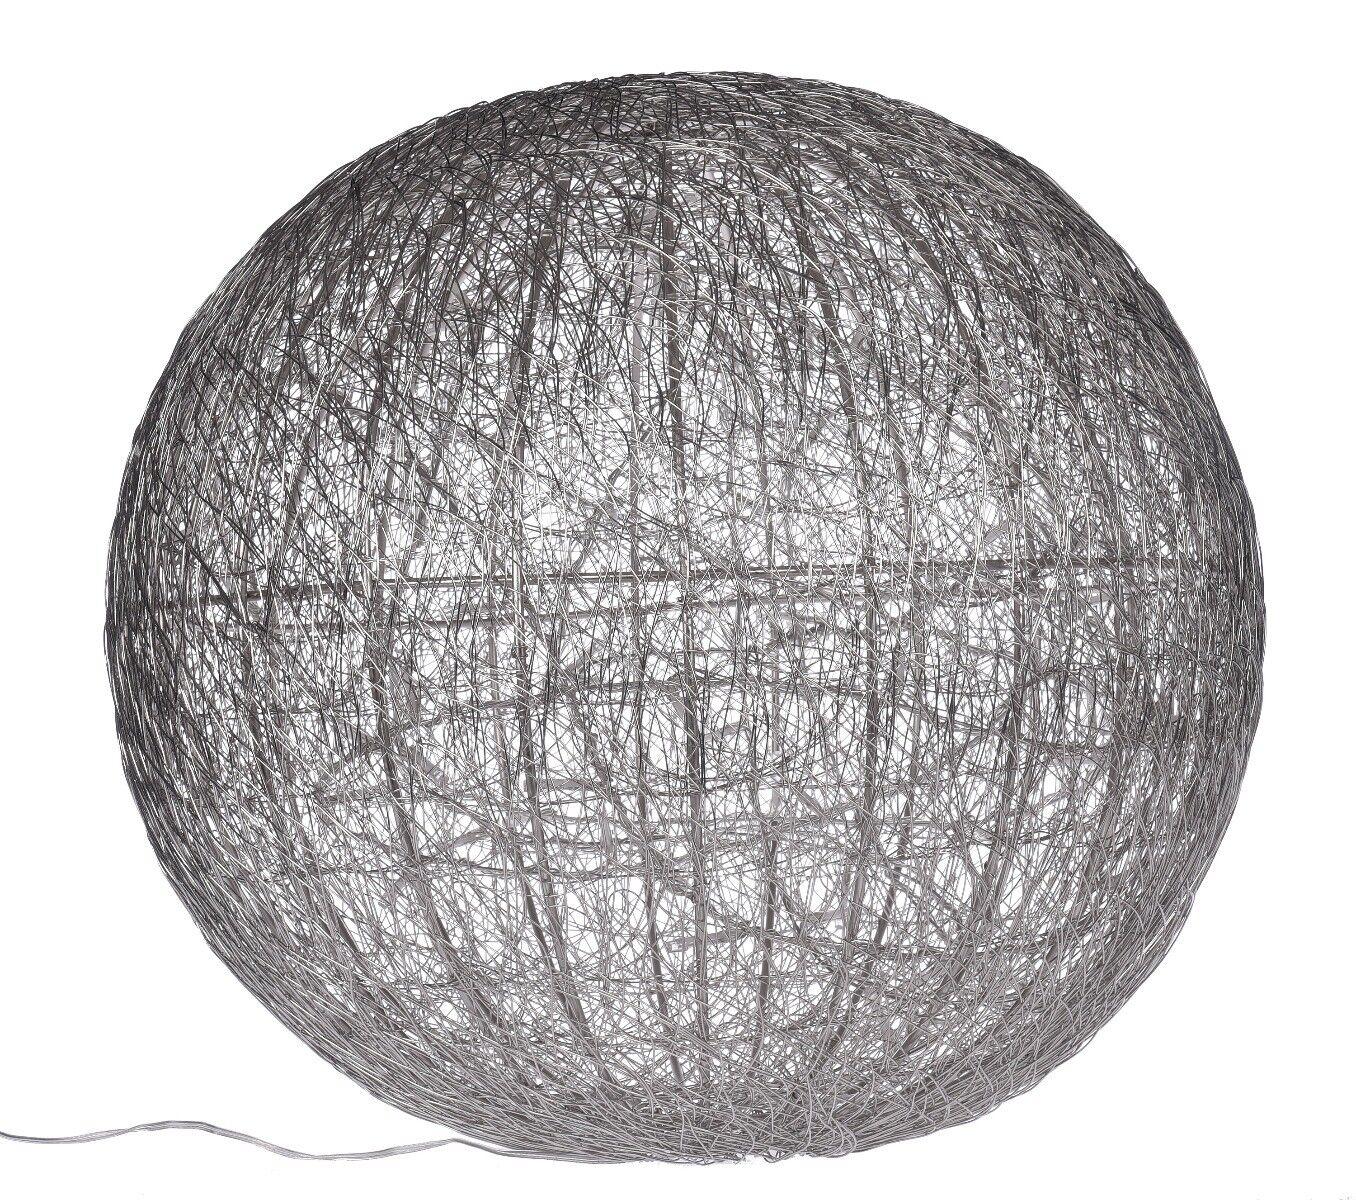 Kula świetlna Octagon śr. 40 cm